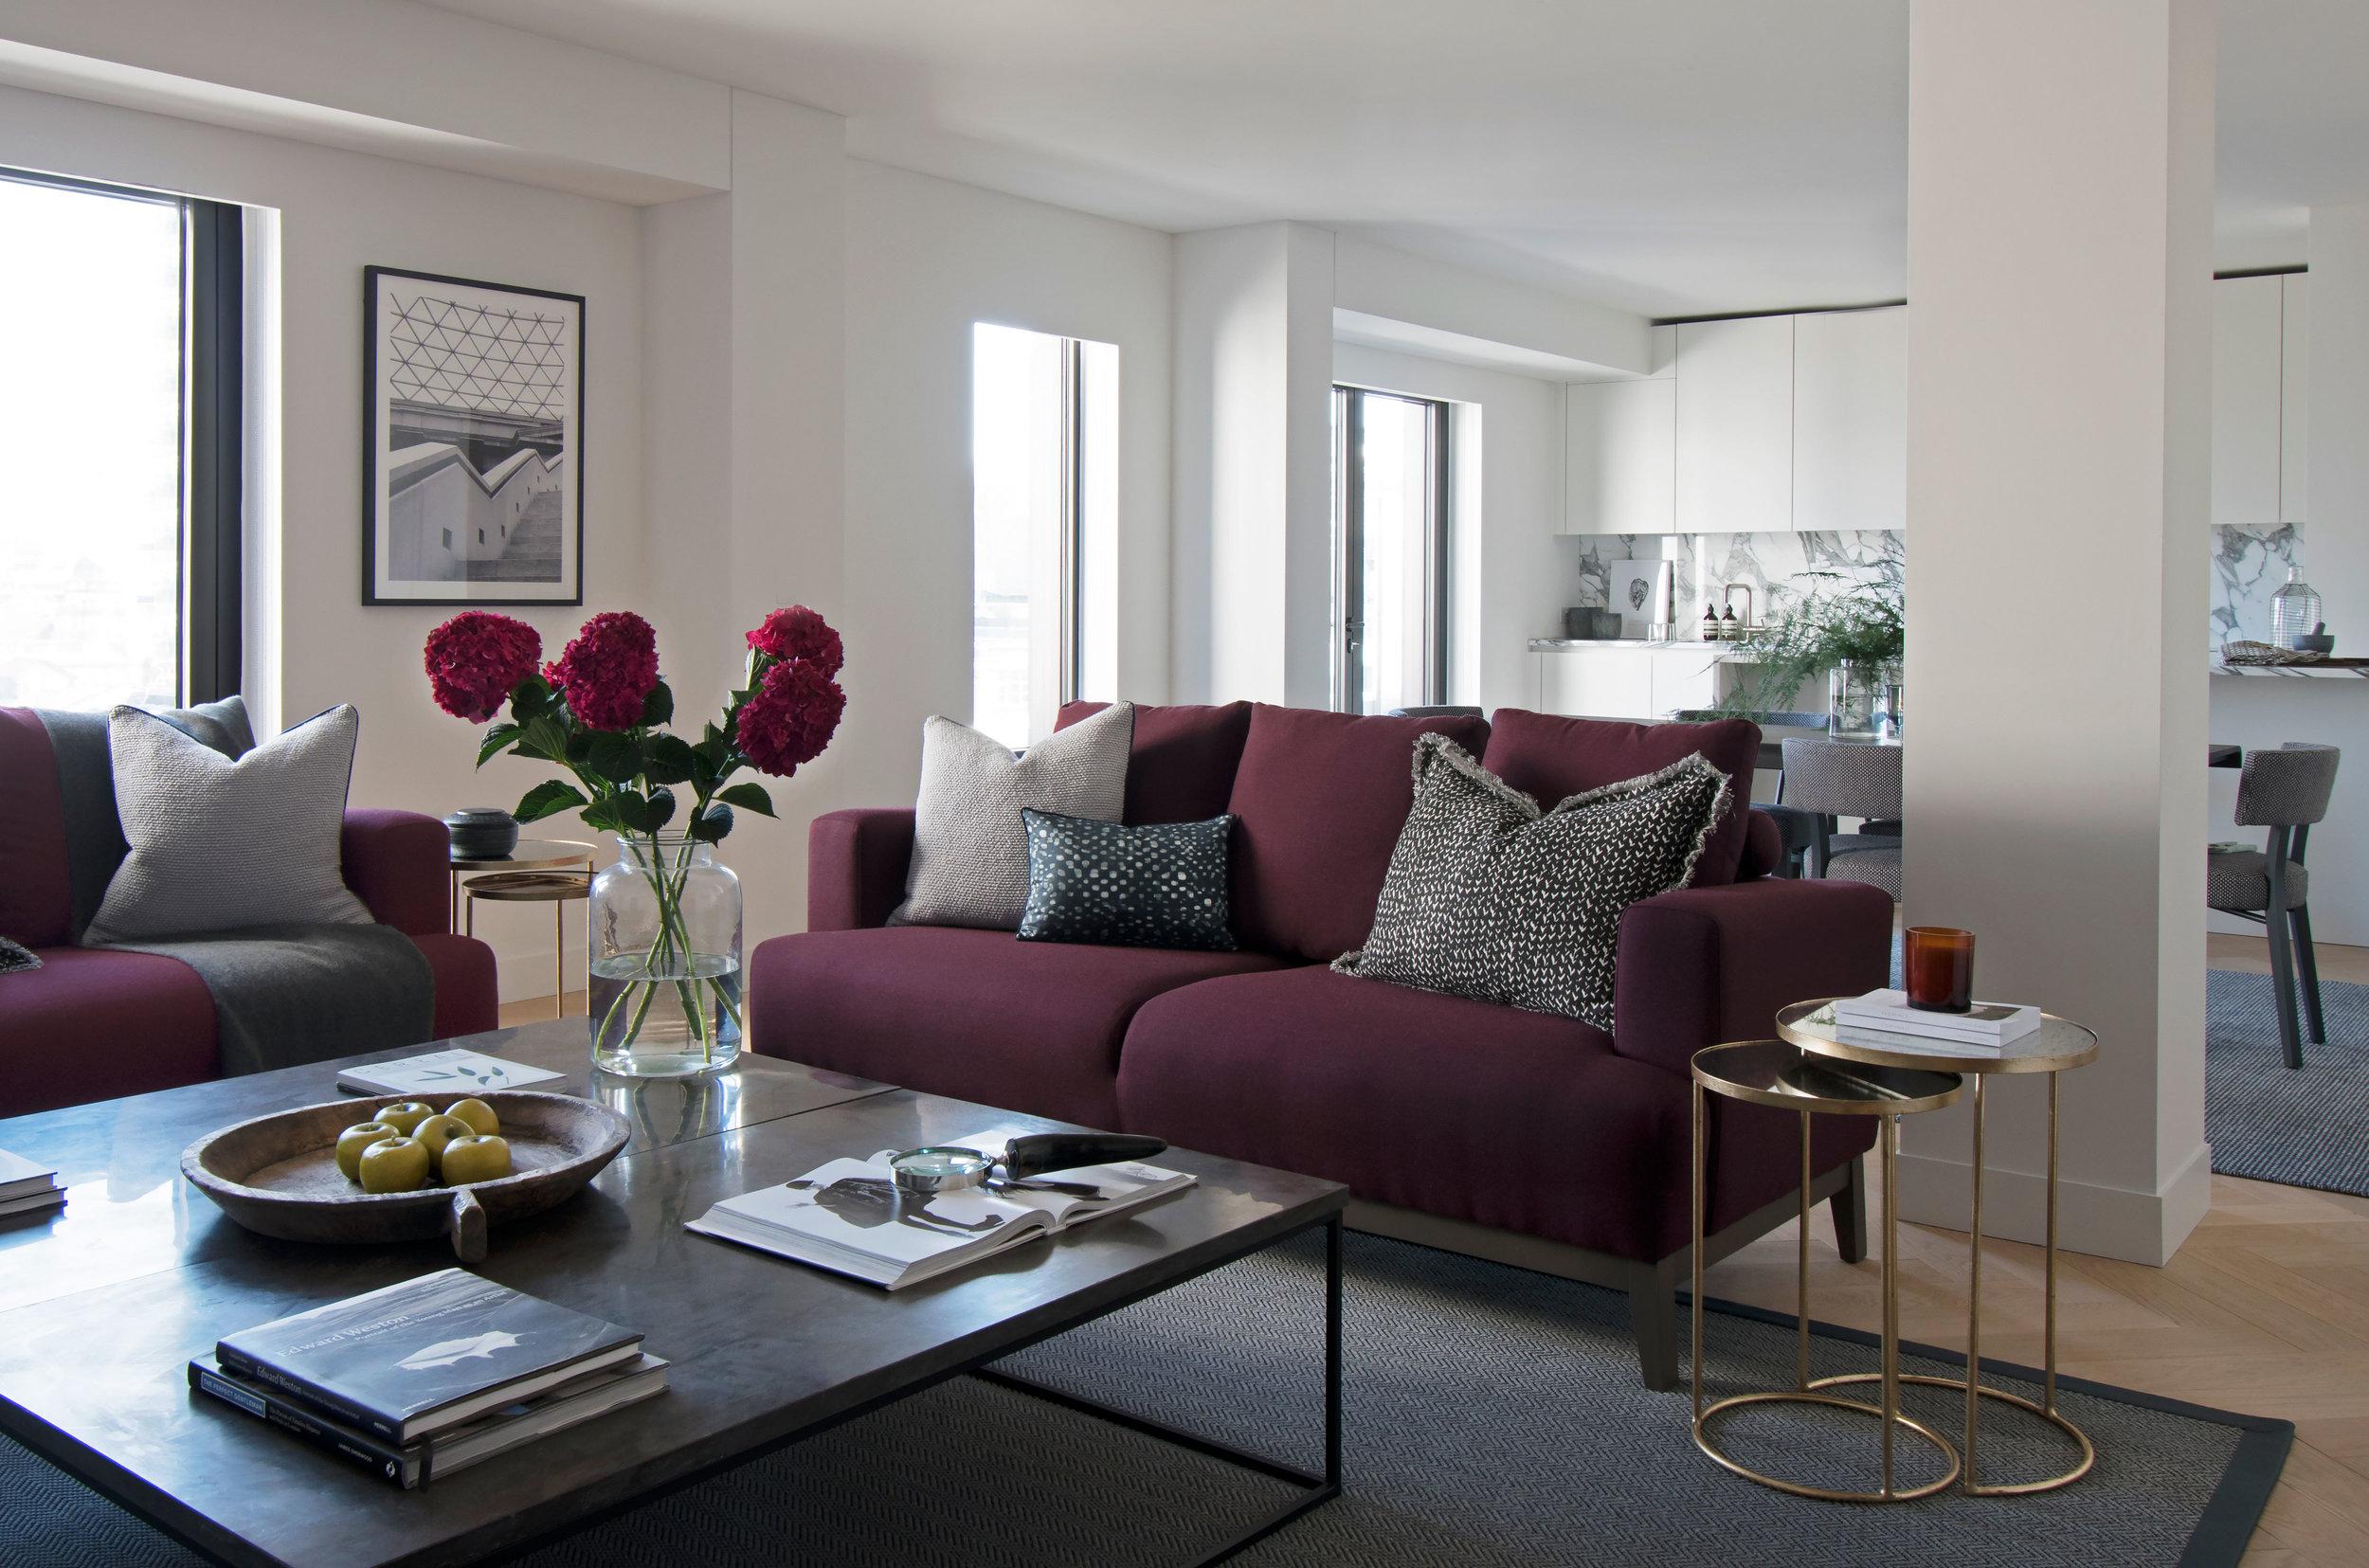 rental_apartment_piccadilly_web.jpg